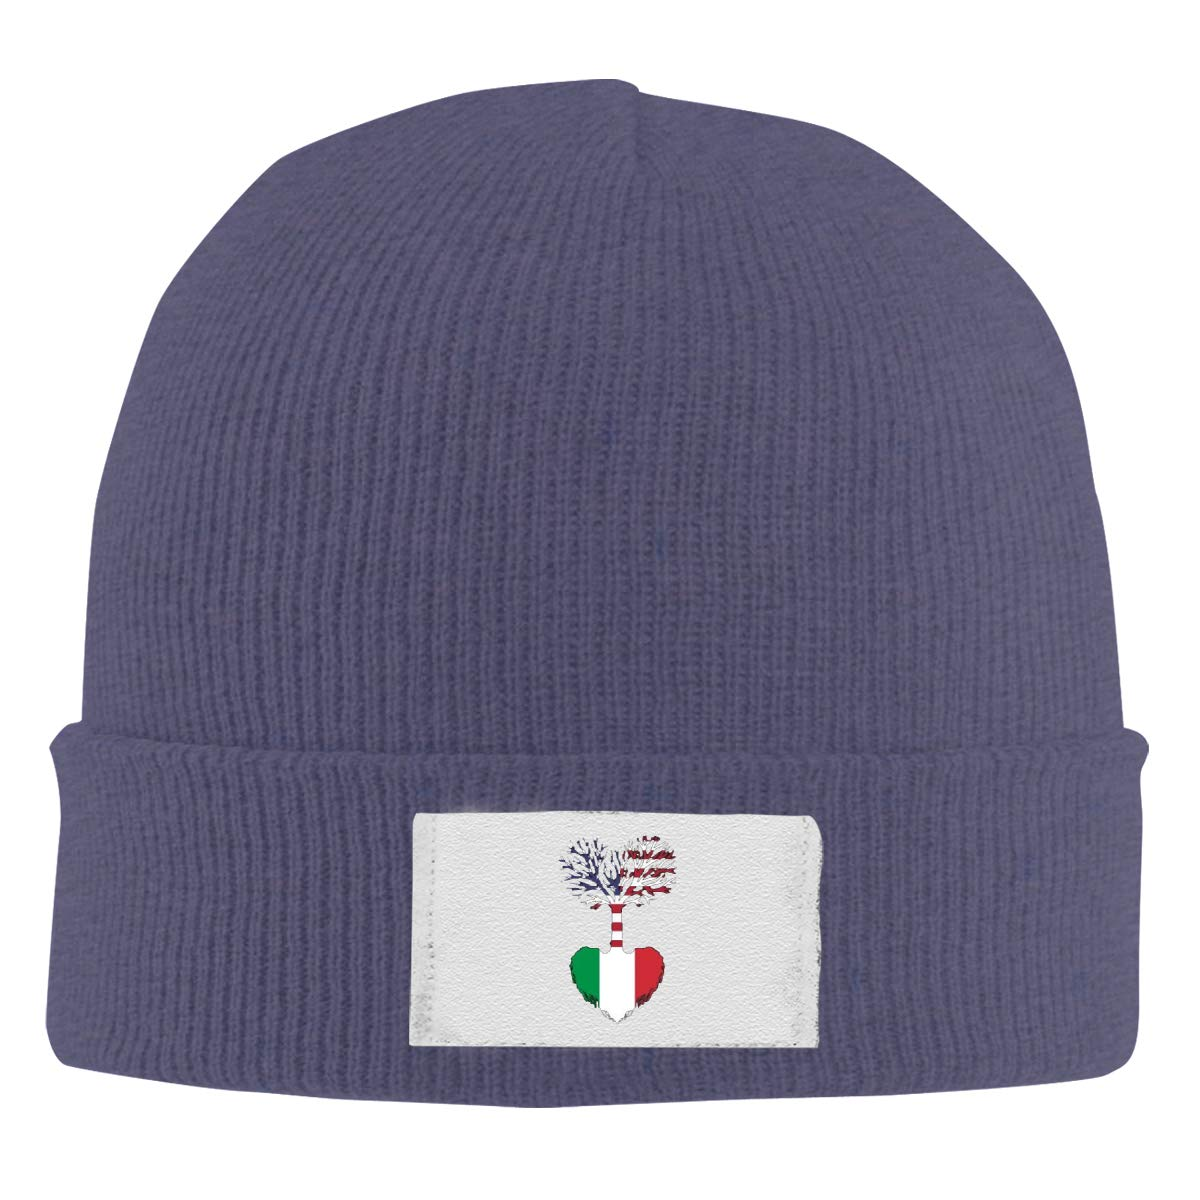 Unisex Stylish Slouch Beanie Hats Black American Grown Italian Root Top Level Beanie Men Women